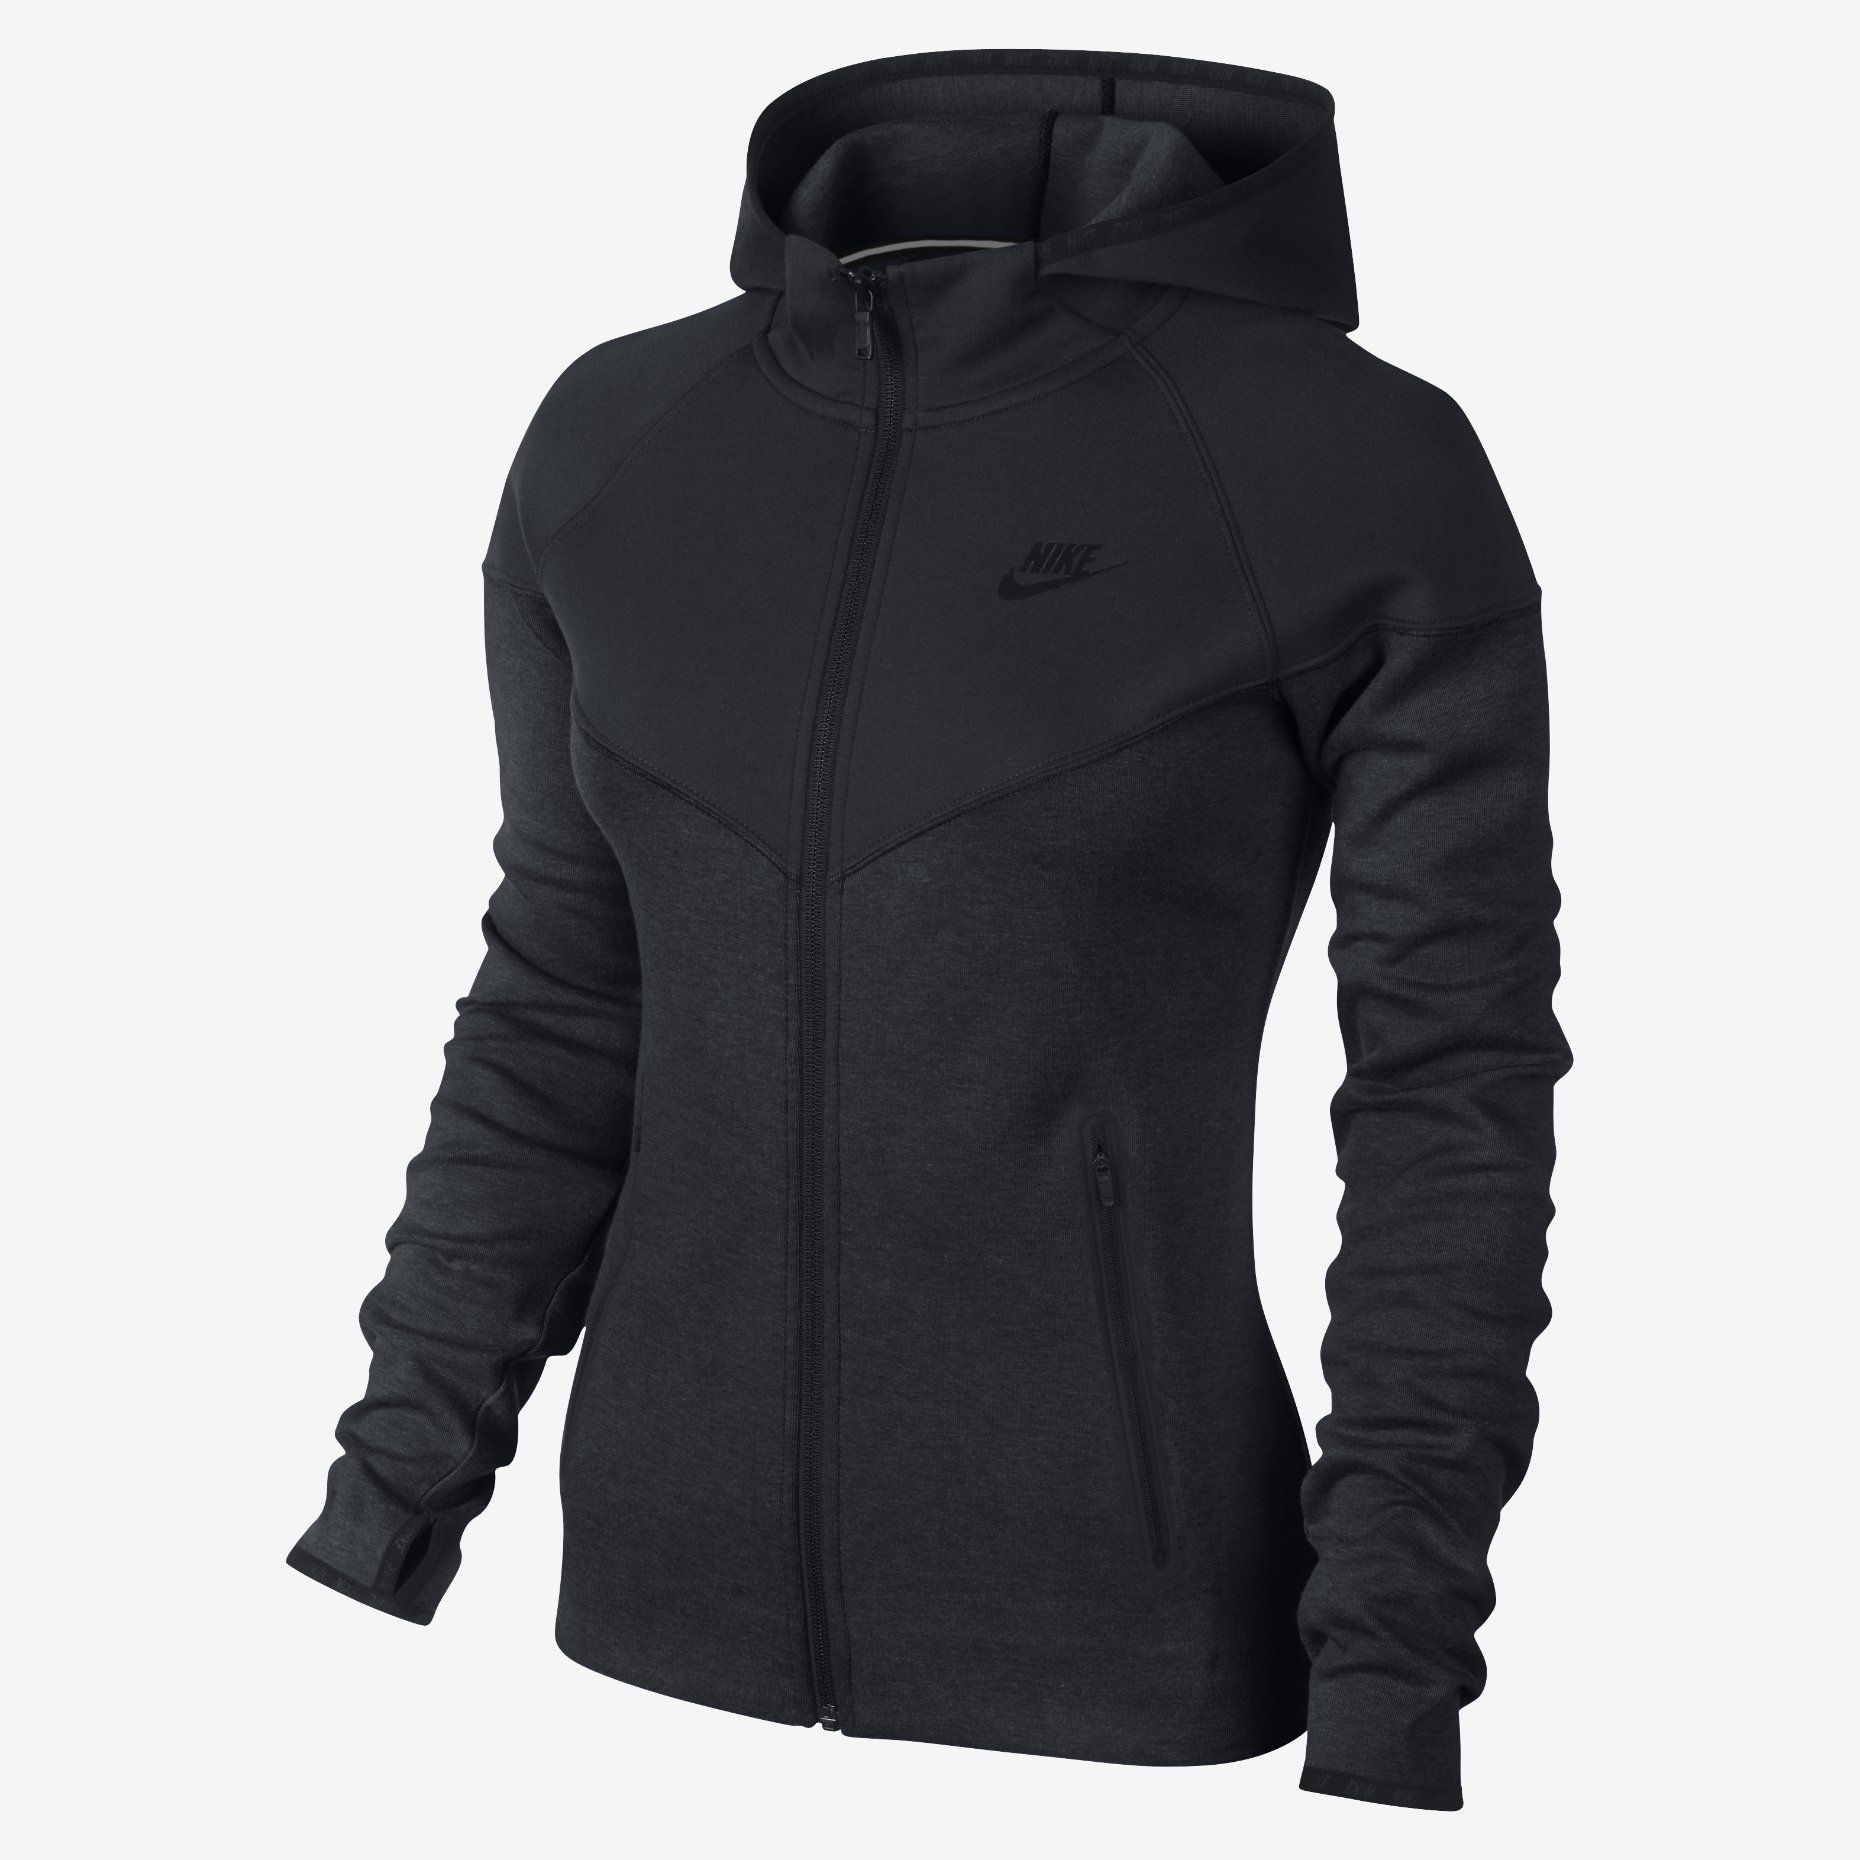 The Nike Tech Fleece Full Zip Women S Hoodie Nike Tech Fleece Frauen Hoodie Nike Tech [ 1860 x 1860 Pixel ]